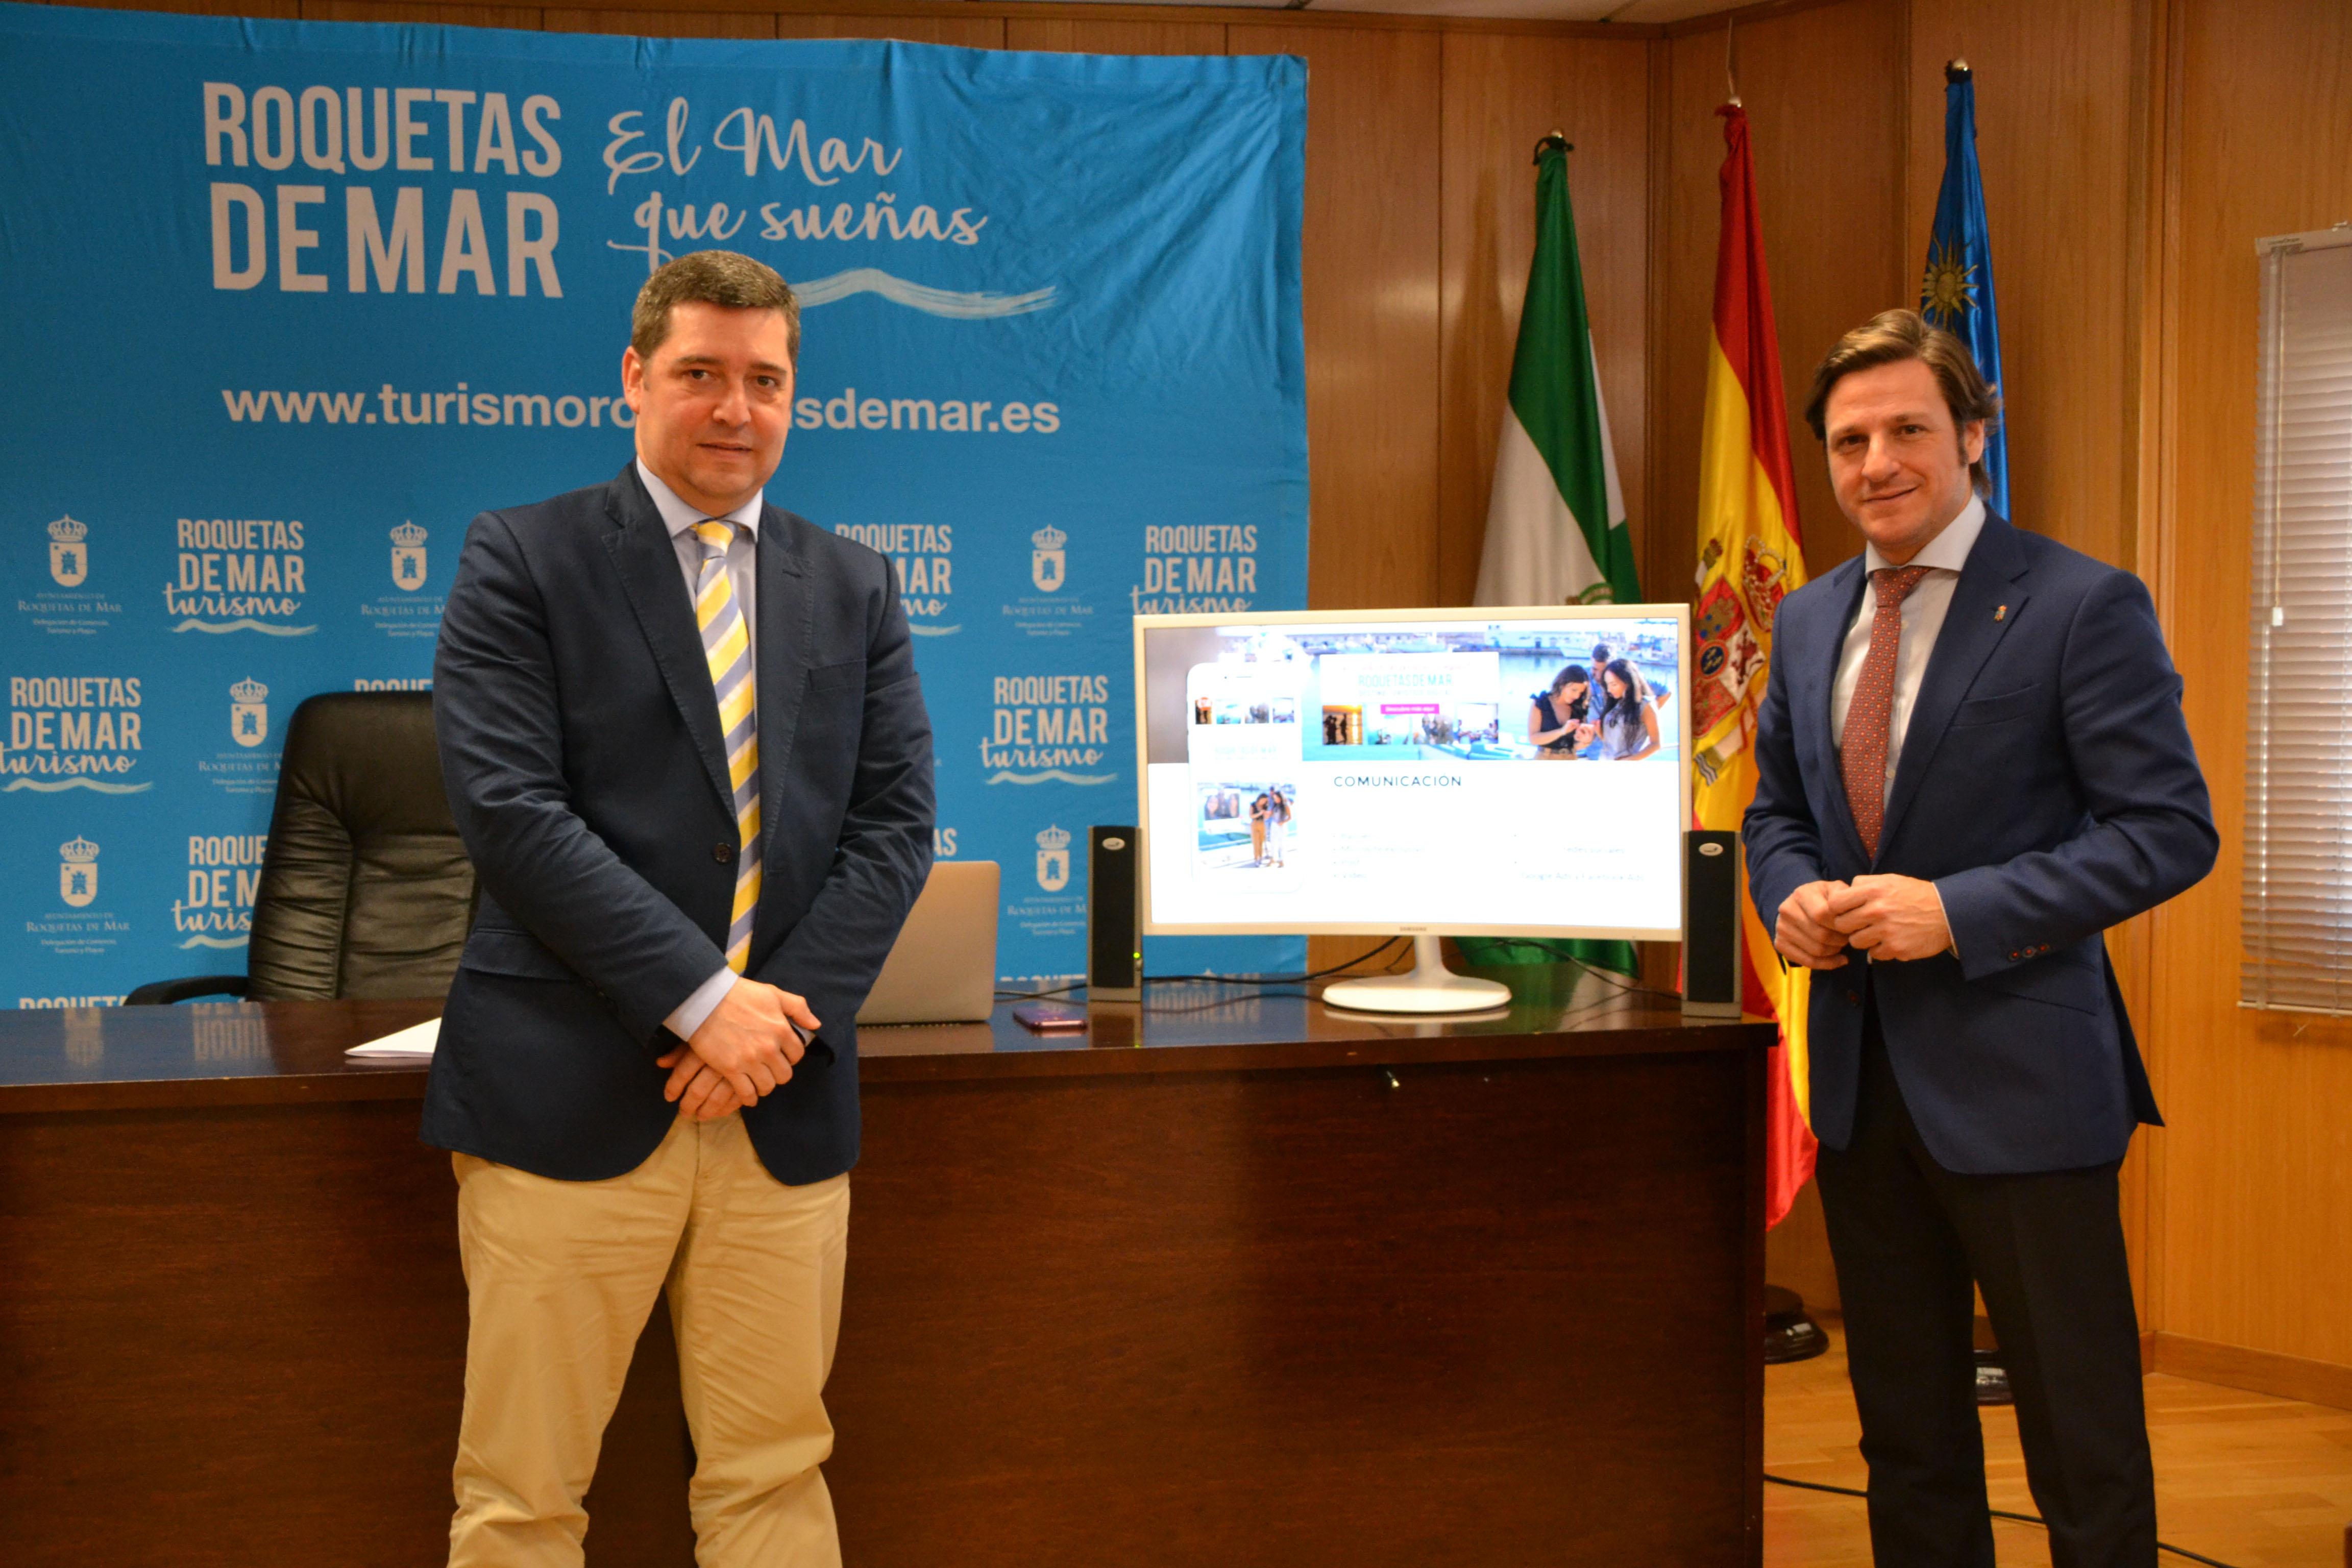 Roquetas de Mar vuelve a elegir a SolBooking para su campaña de promoción de destino